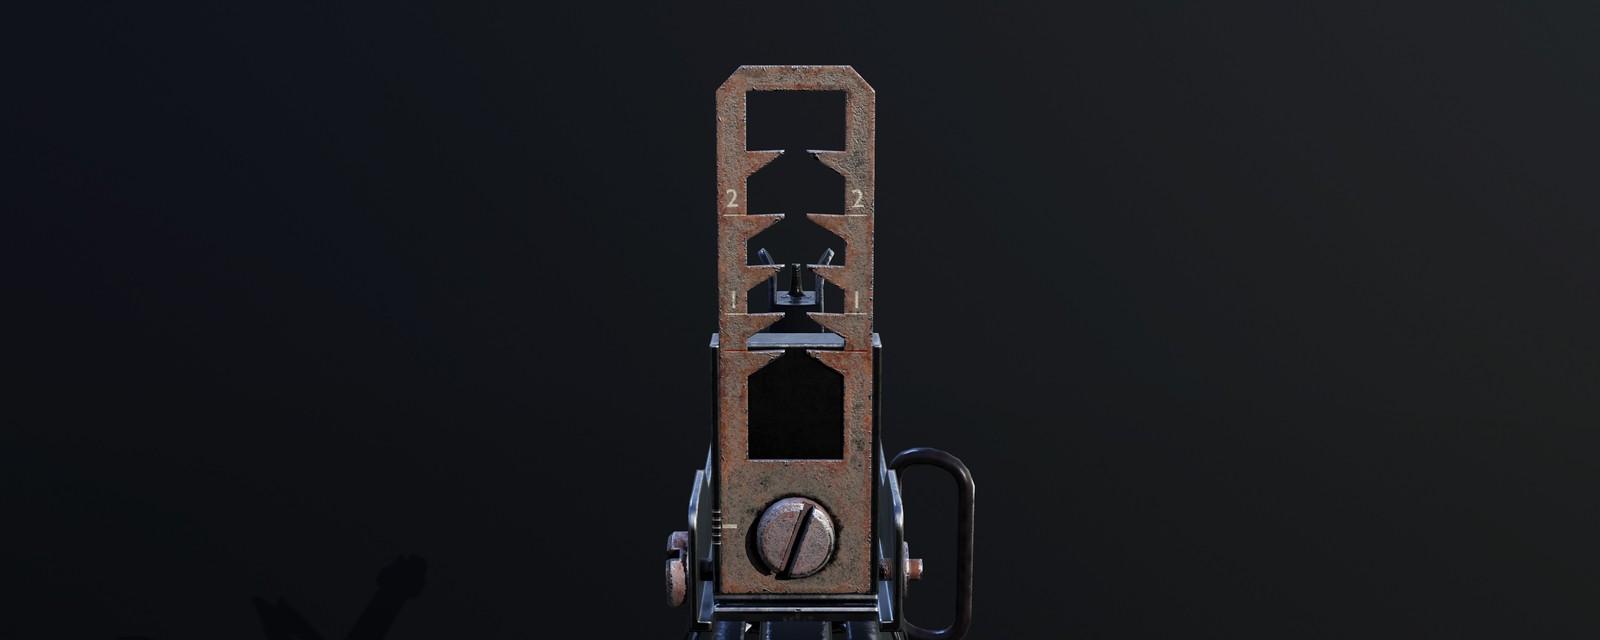 M203 Grenade Launcher Sight